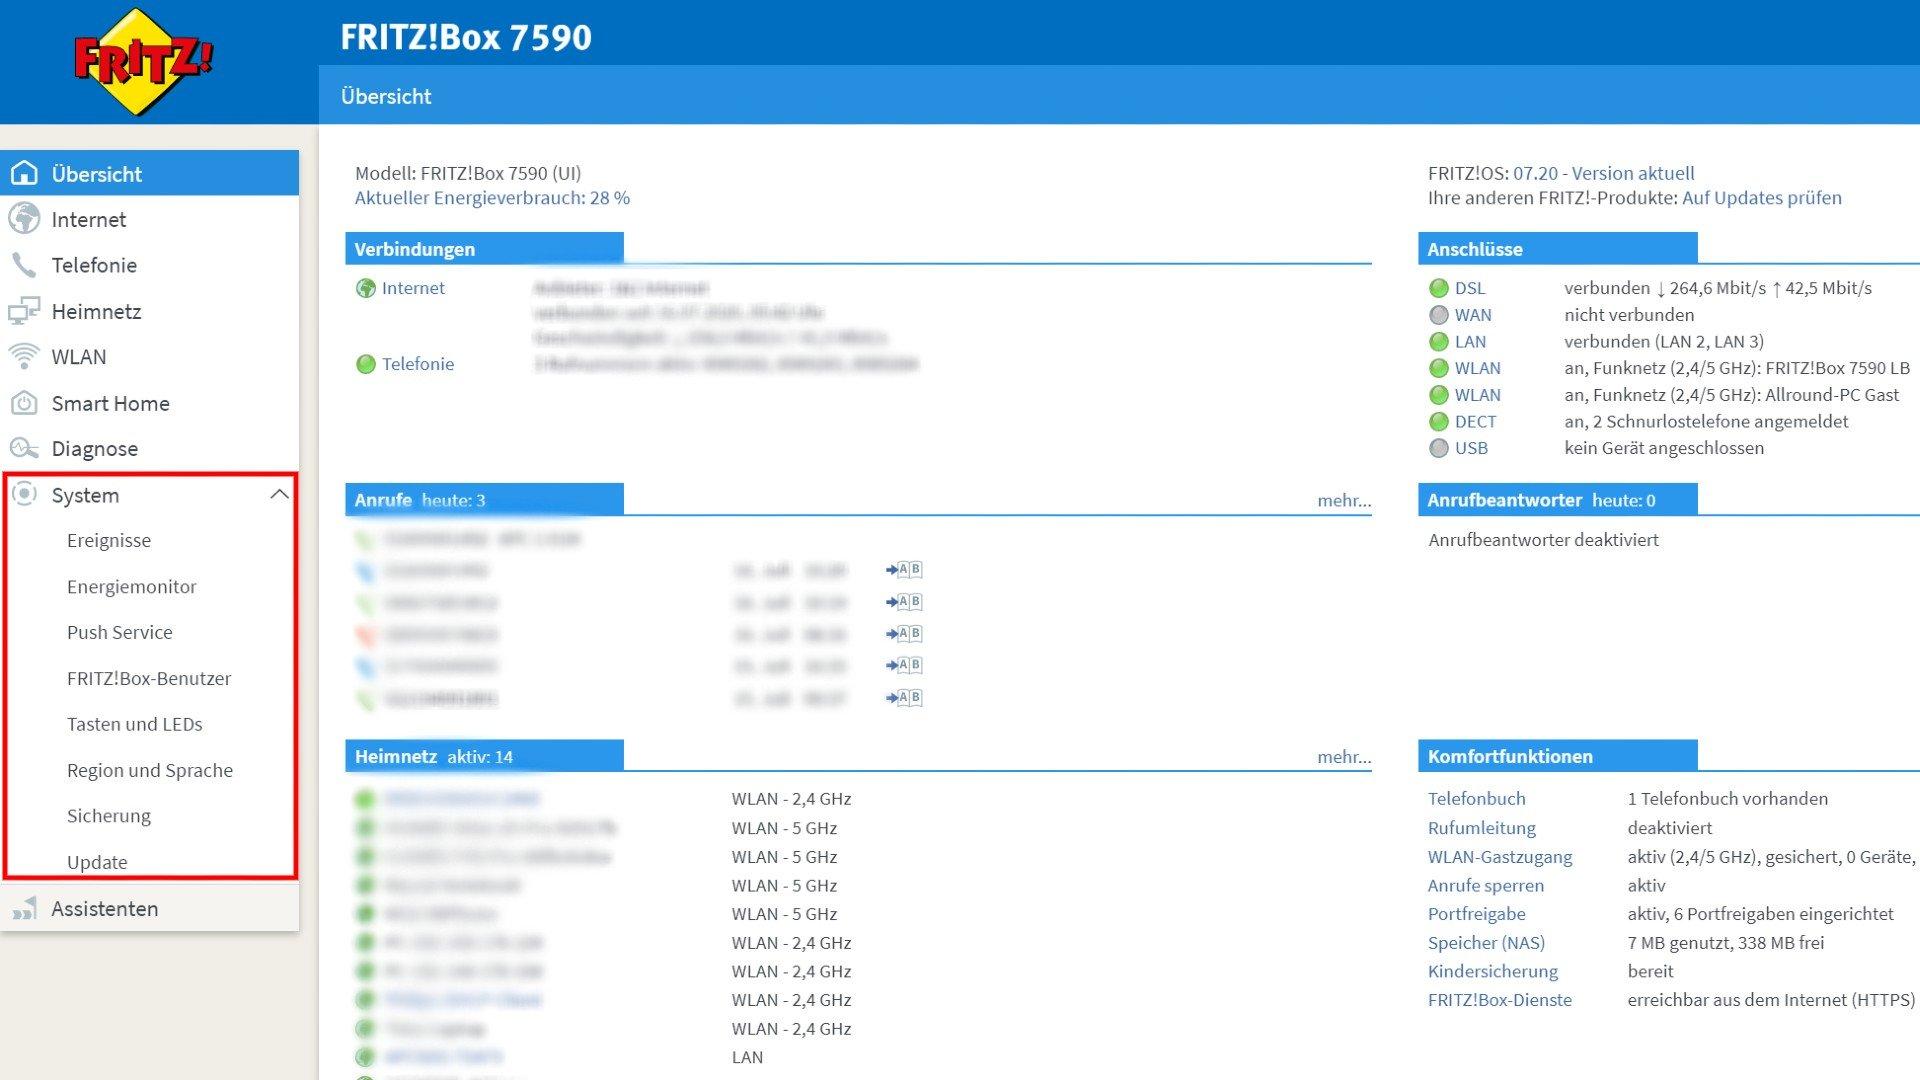 Anleitung FRITZOS Firmware auf der FRITZBox updaten